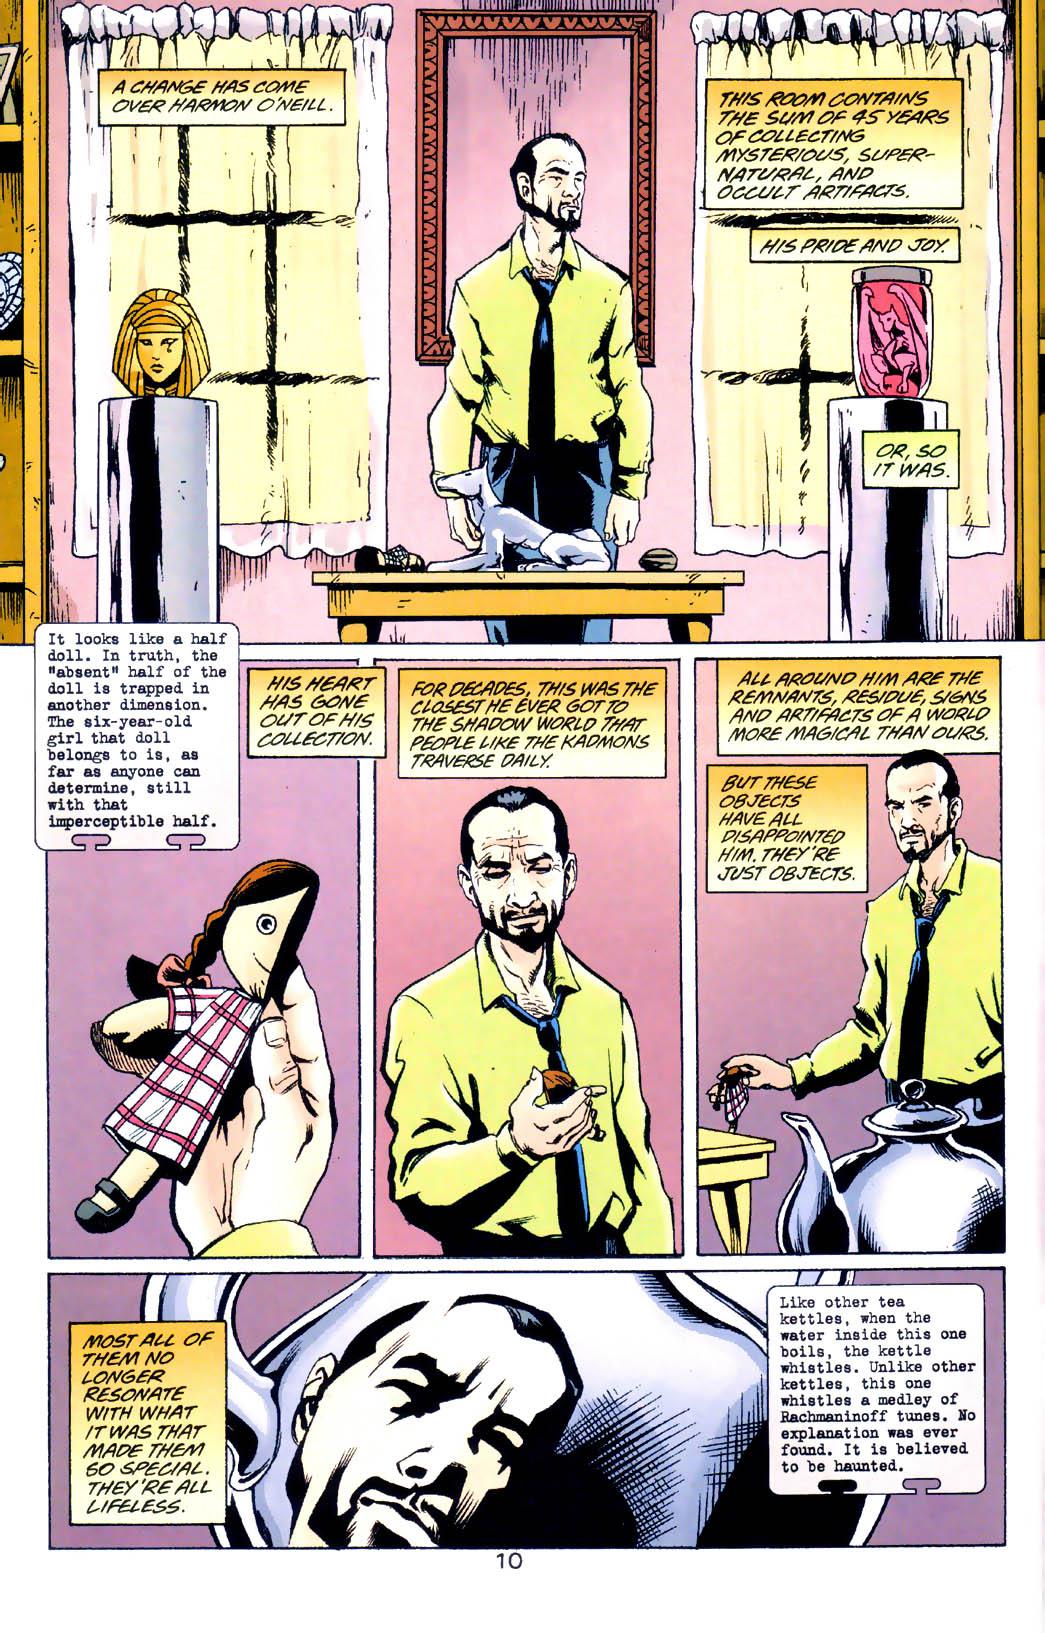 Read online Midnight, Mass comic -  Issue #6 - 11